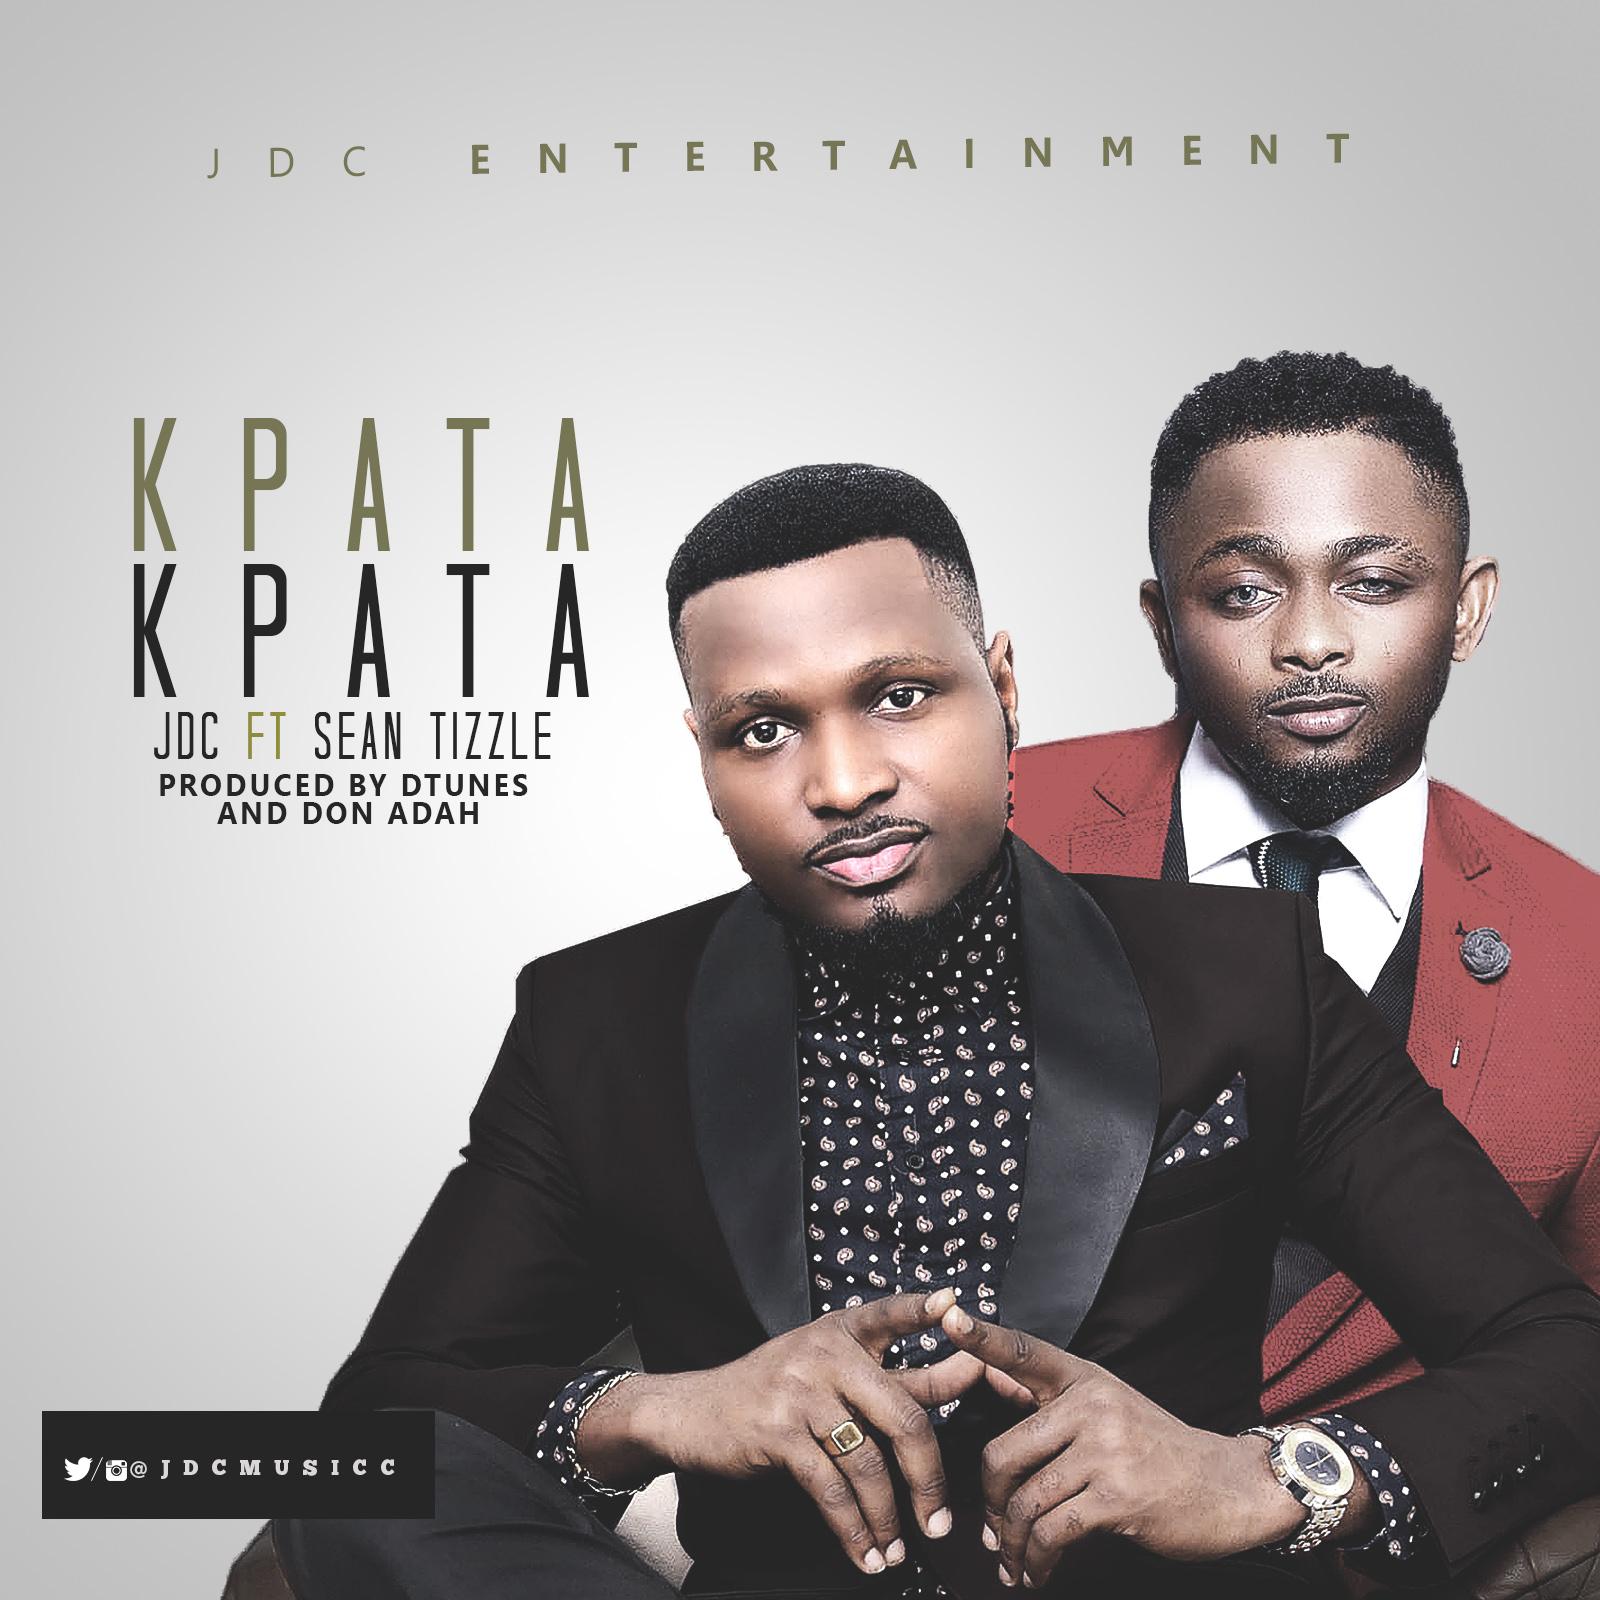 JDC ft. Sean Tizzle - Kpata Kpata